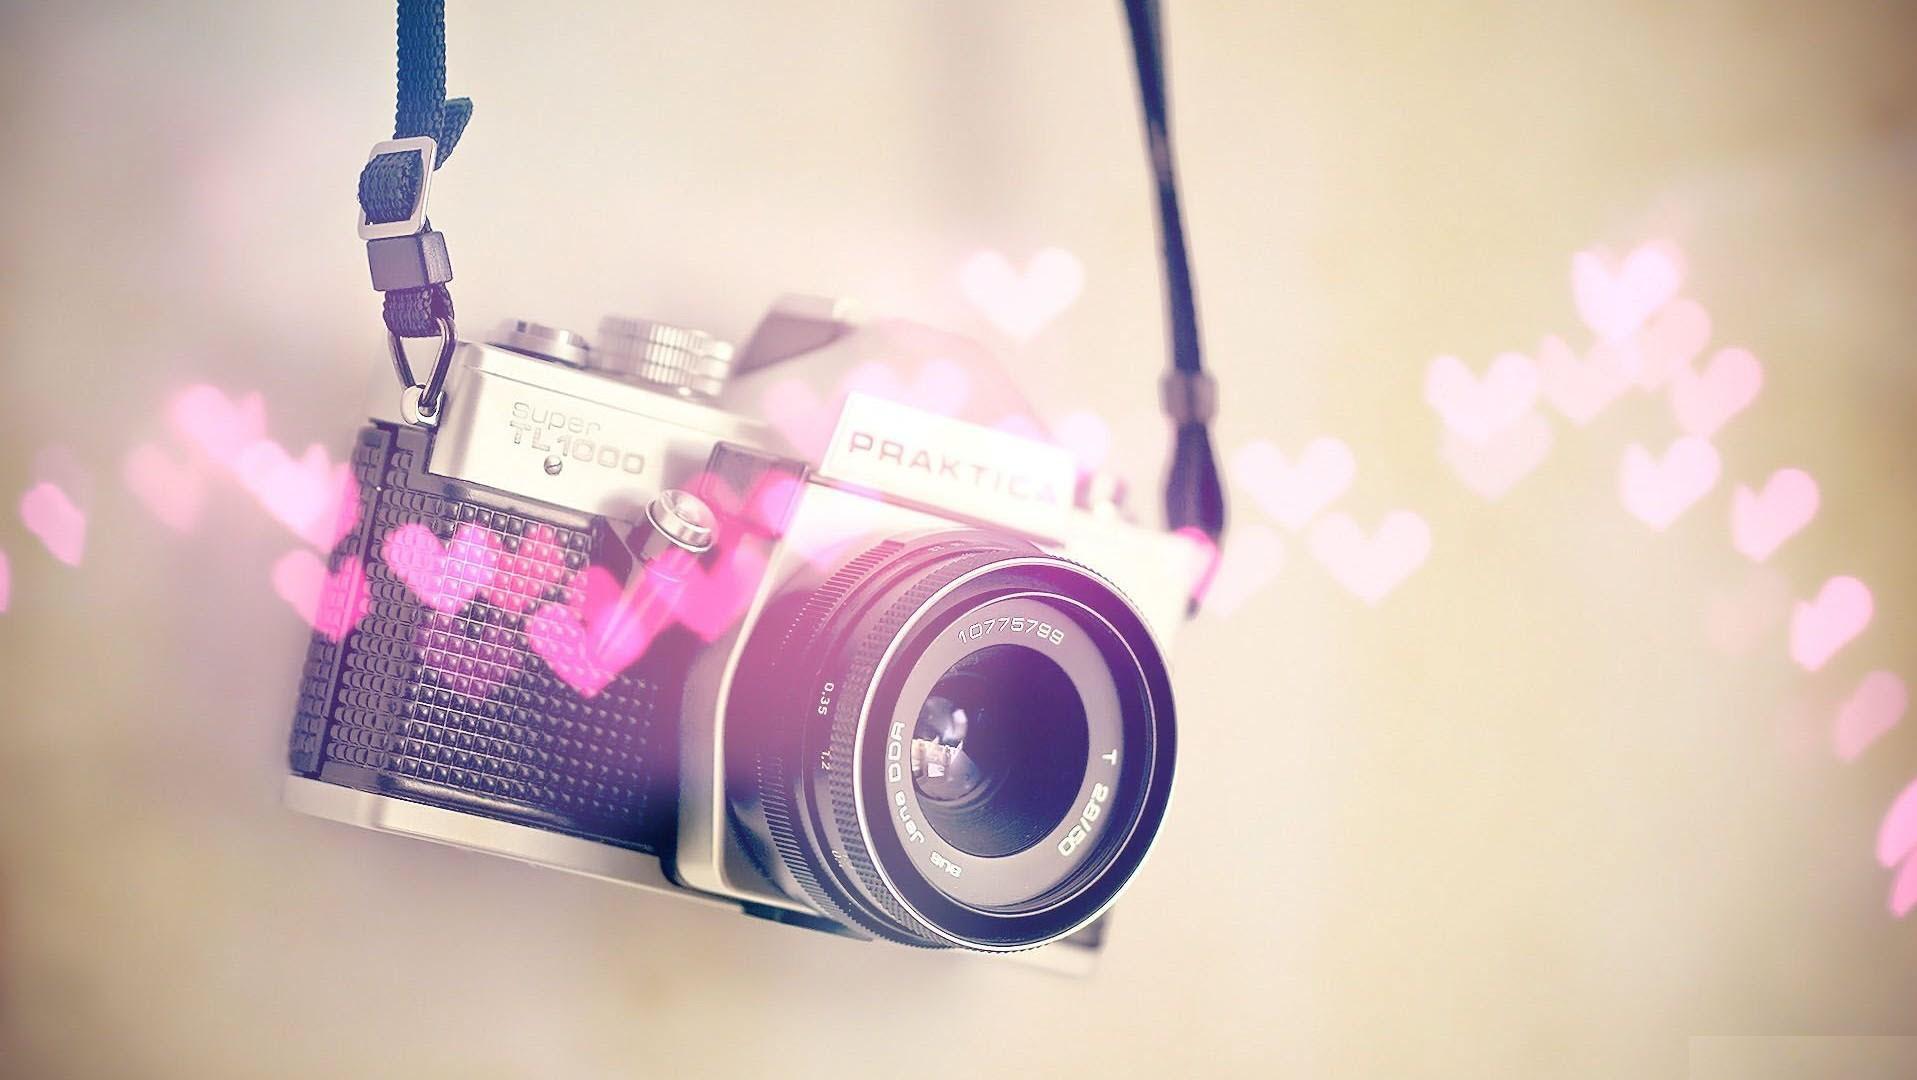 hinh-nen-cute-cho-may-tinh-dep-nhat-wallppaer-cute-21.jpg